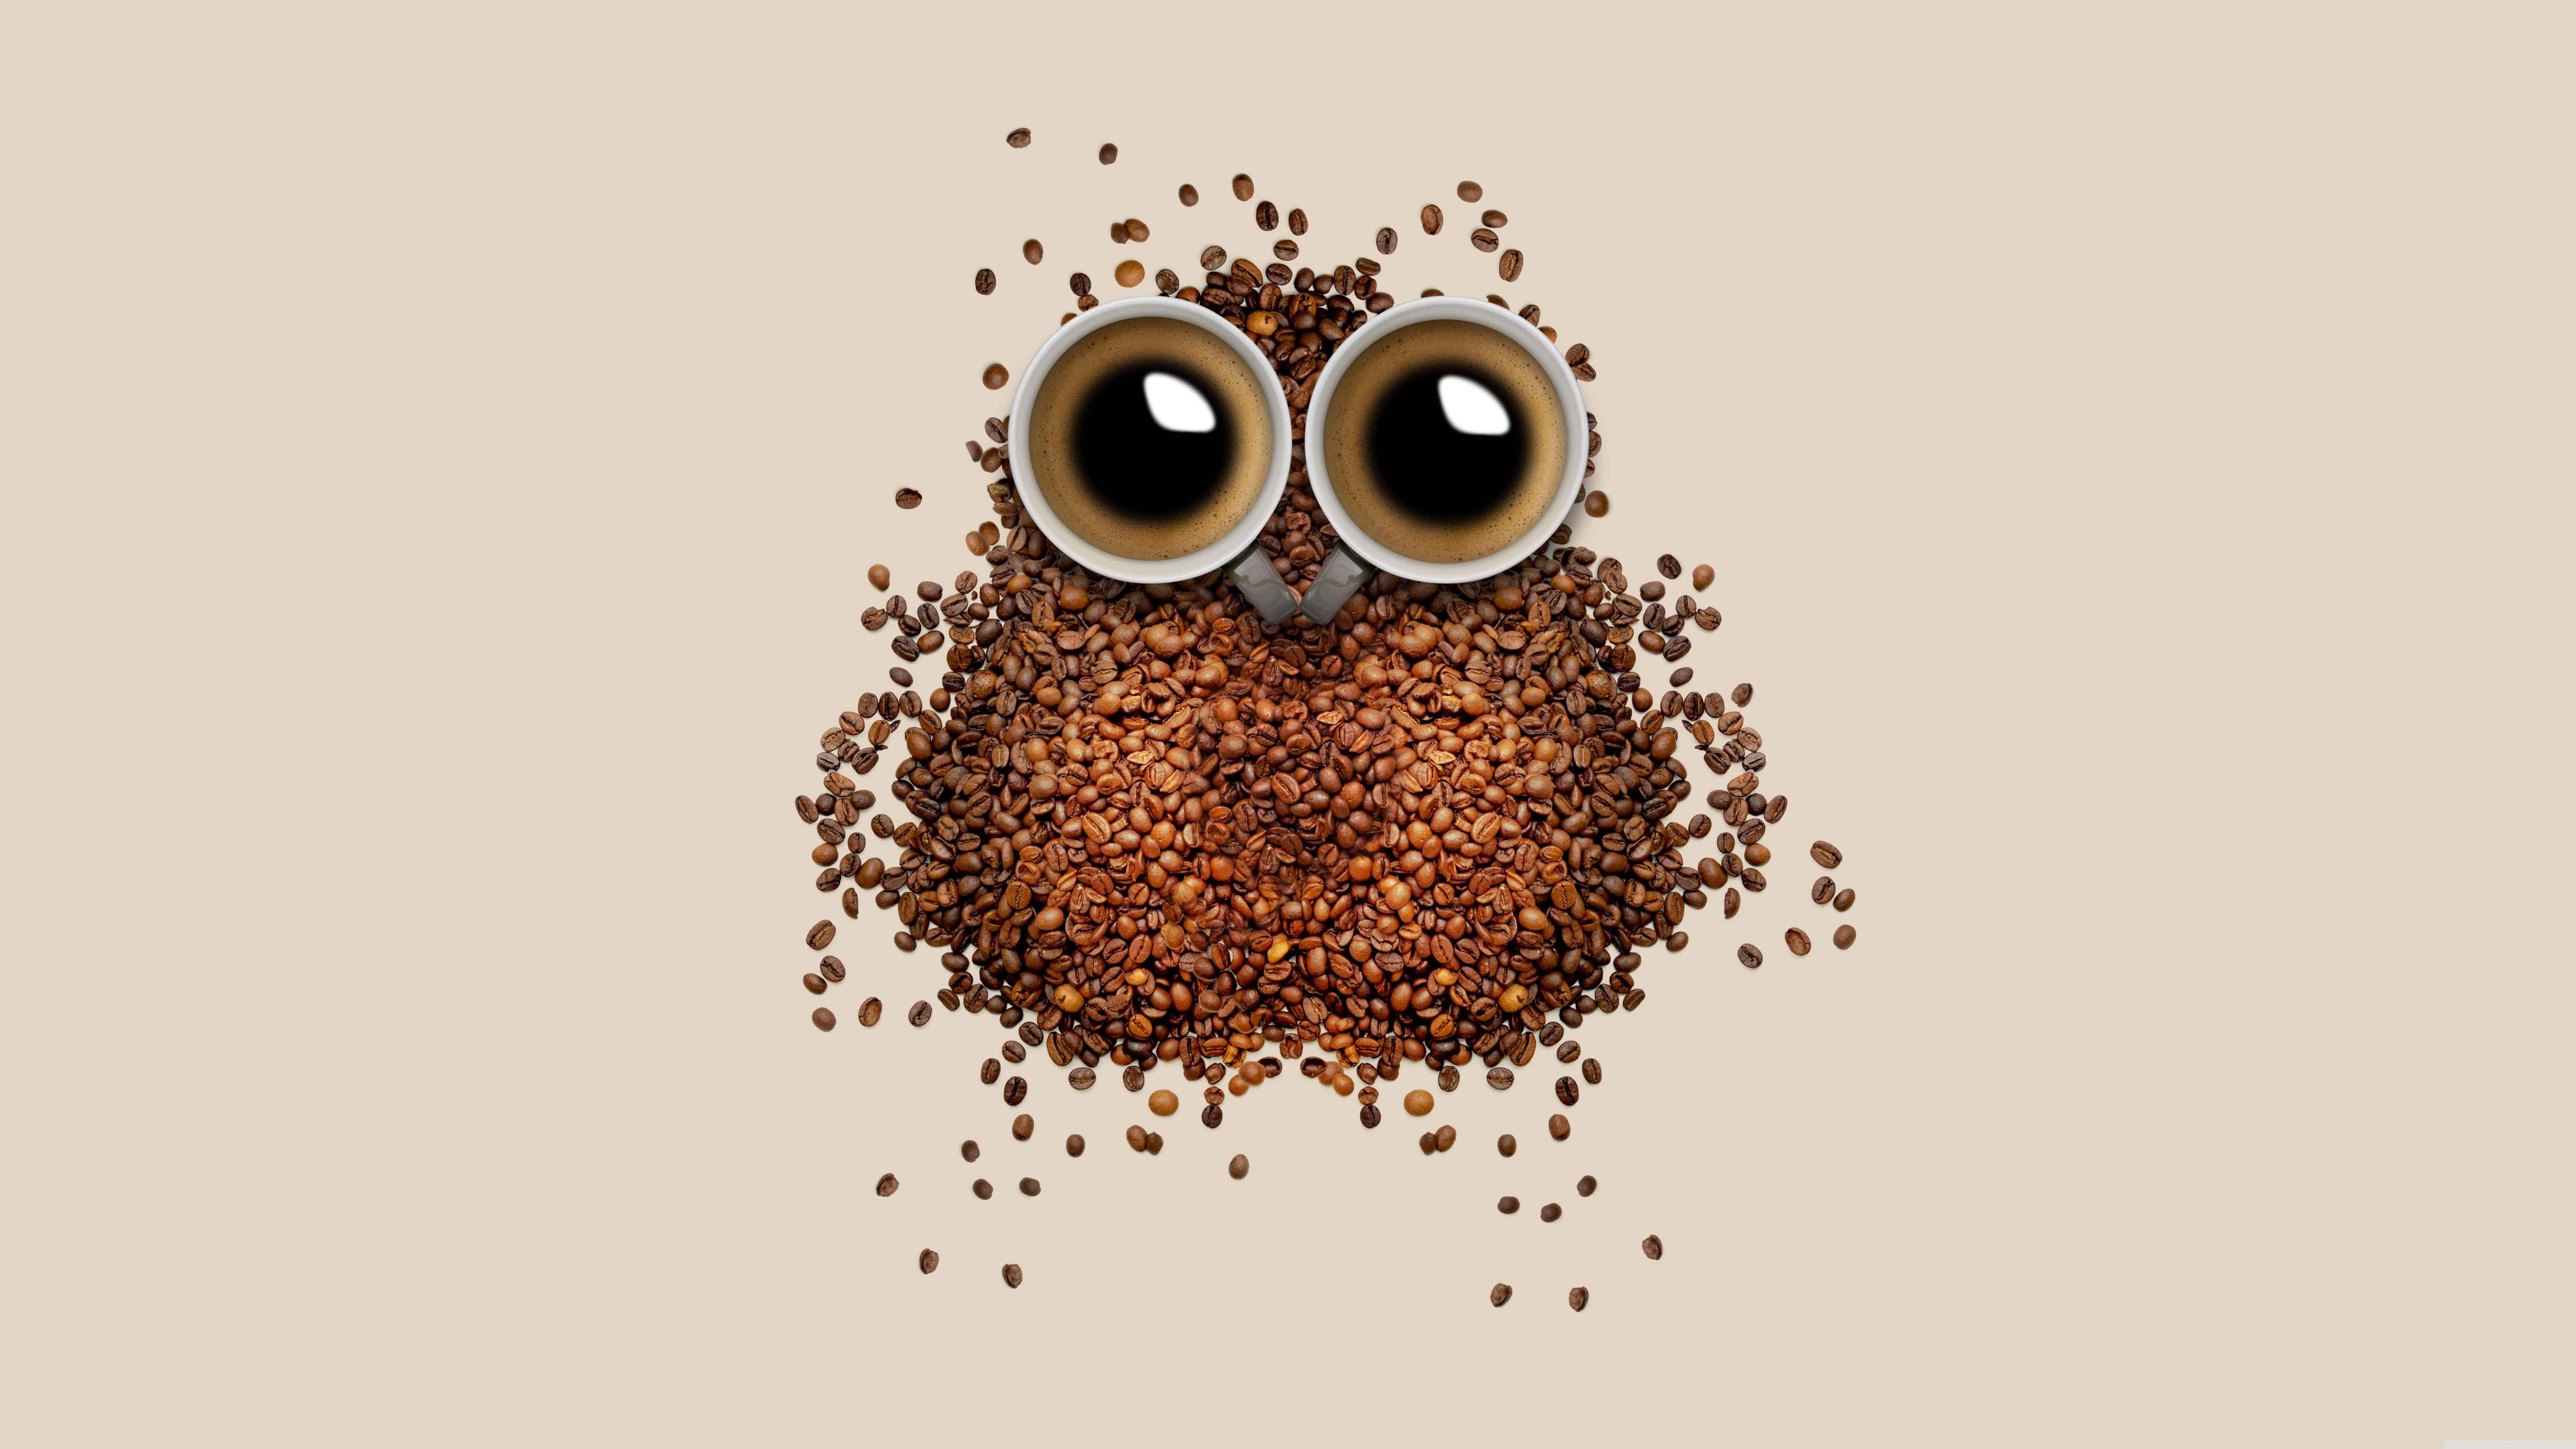 Ultra Hd Desktop Wallpapers Coffee Bean Owl Uhd 8k Wallpaper Pixelz